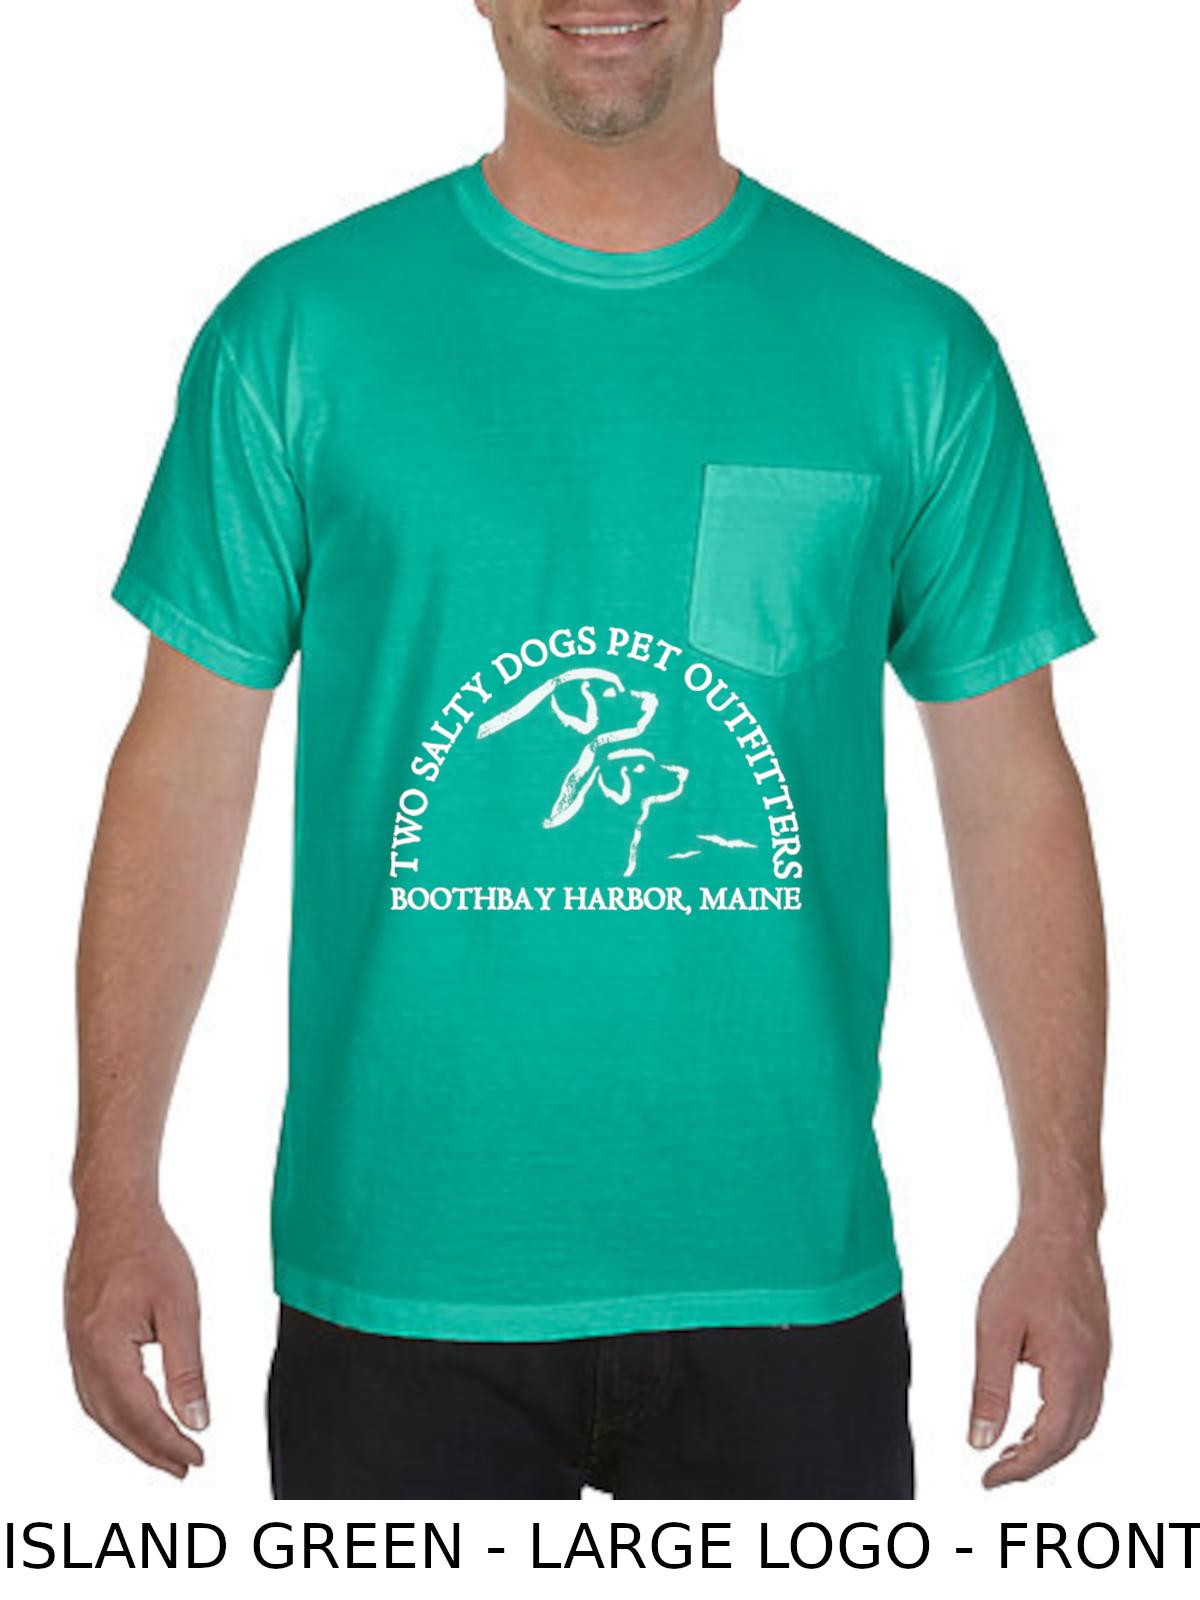 bbha-ss-t-shirt-pocket-island-green-front